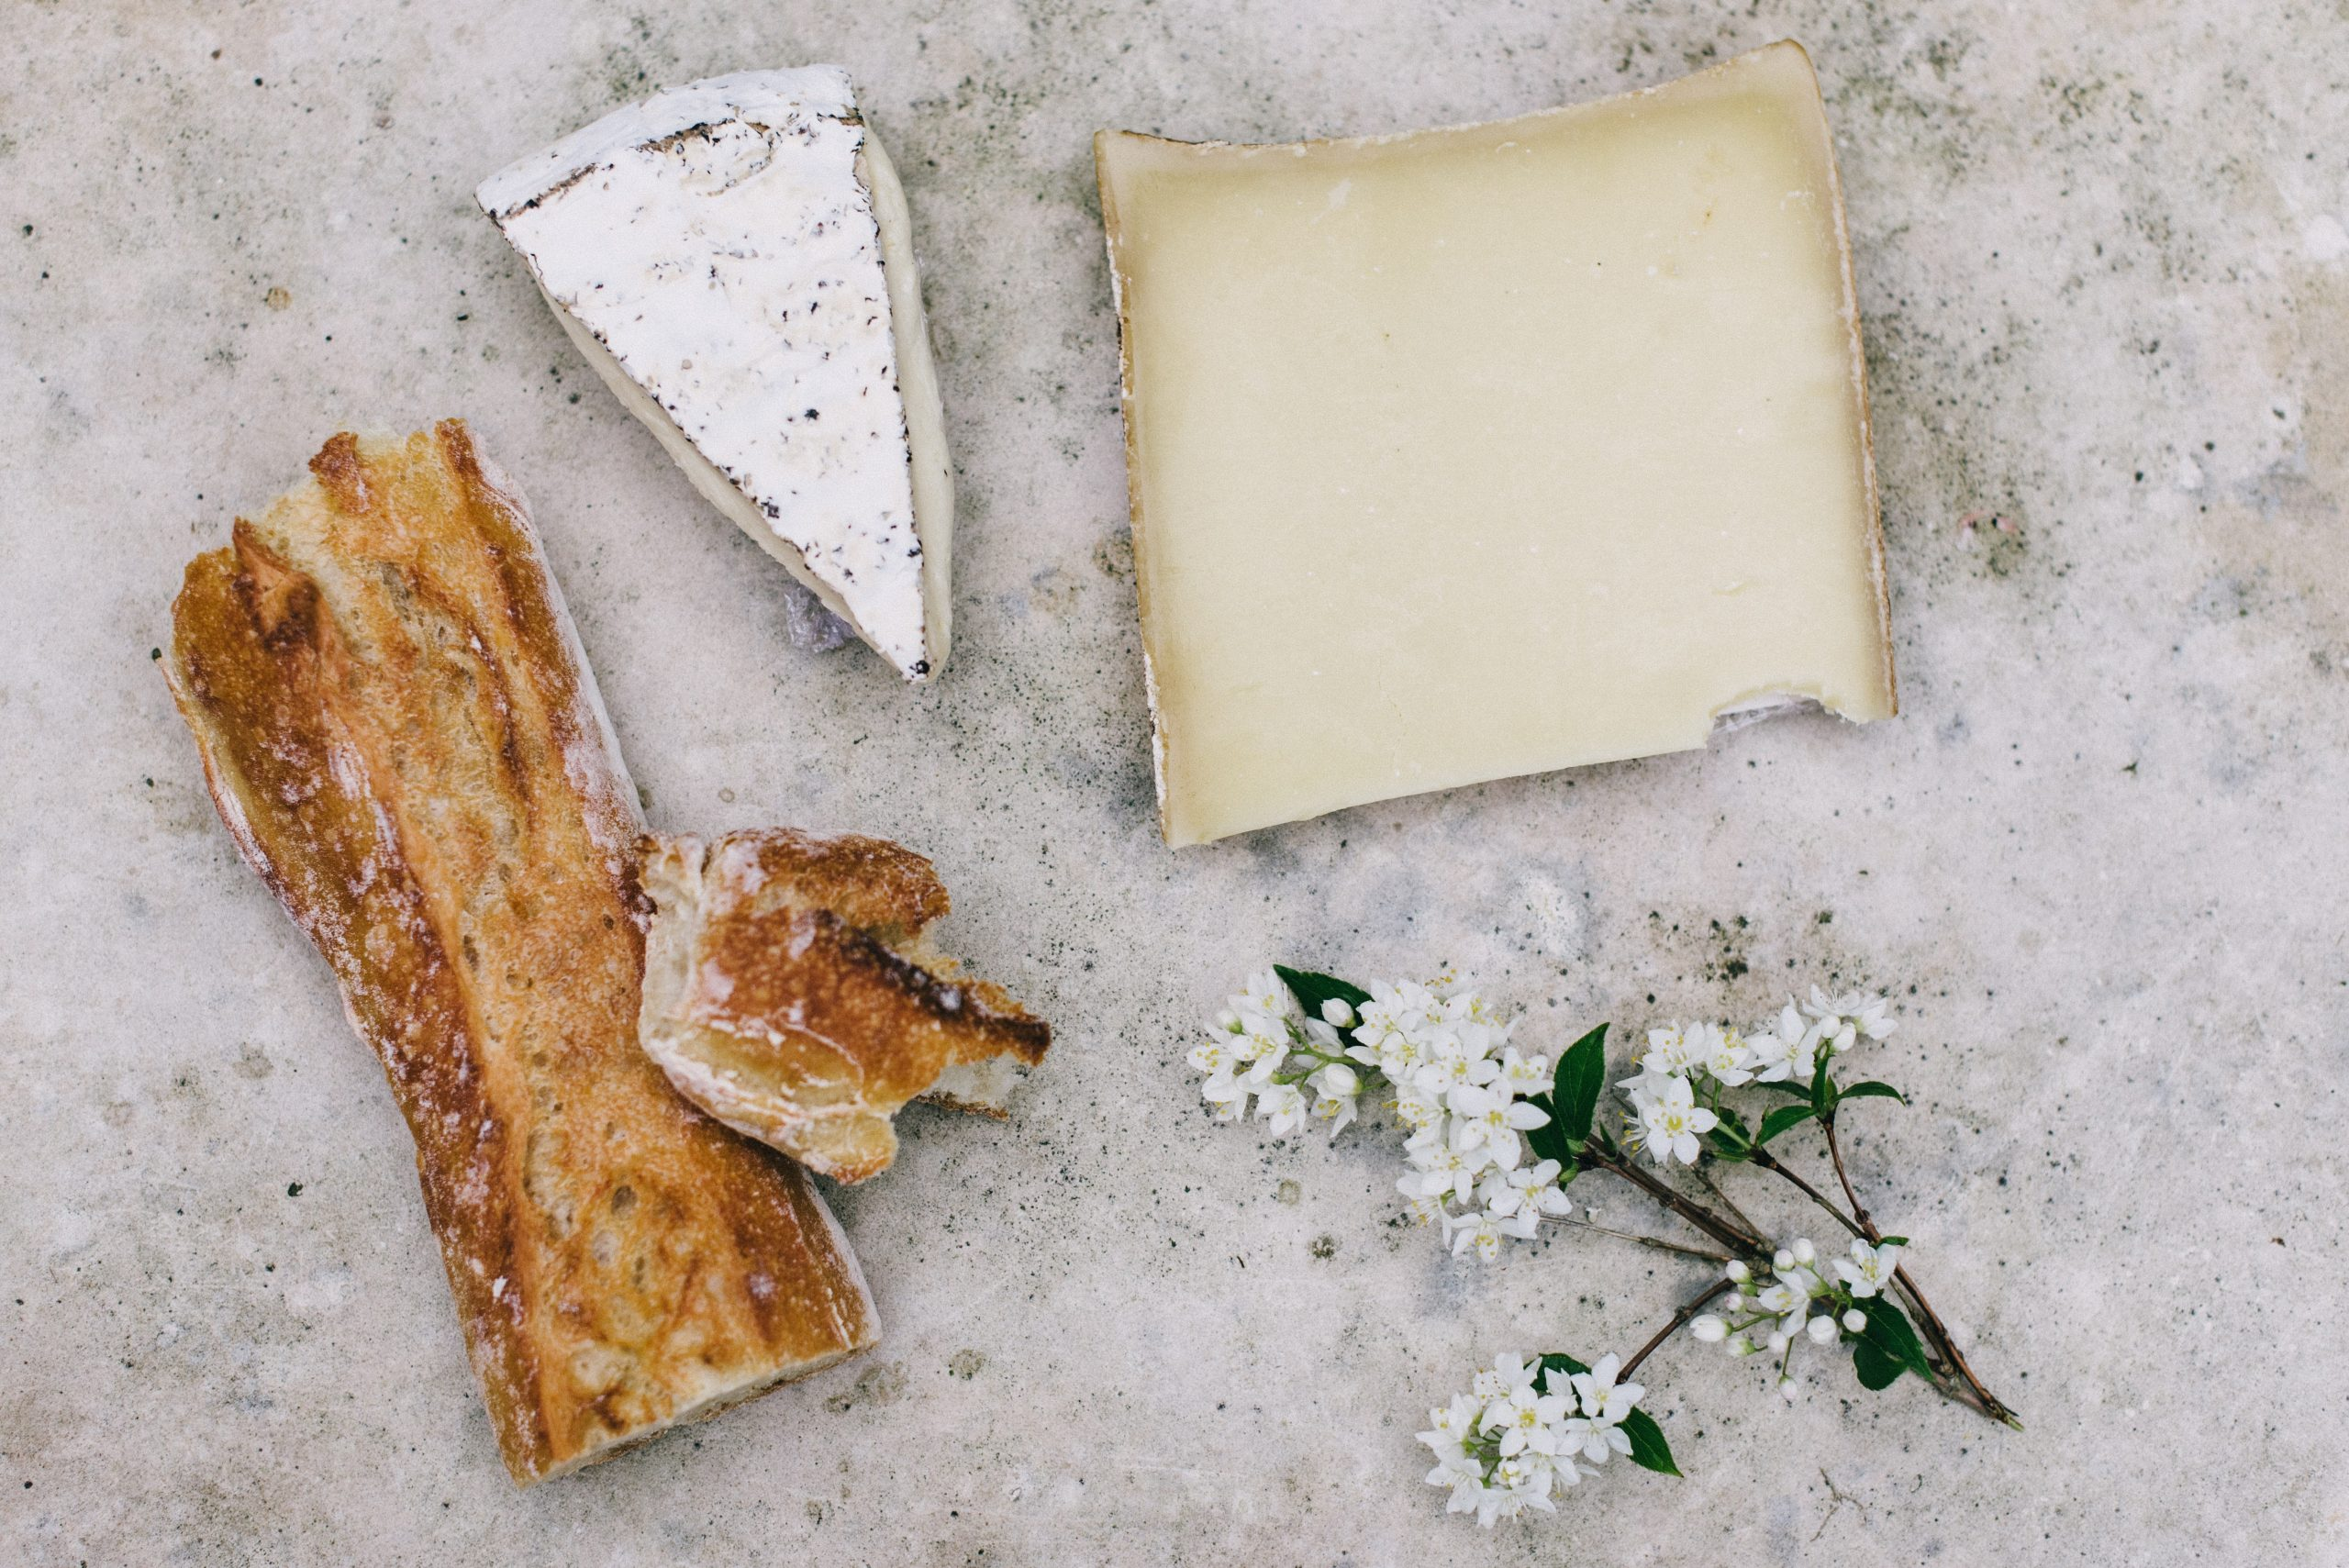 fromage végétal